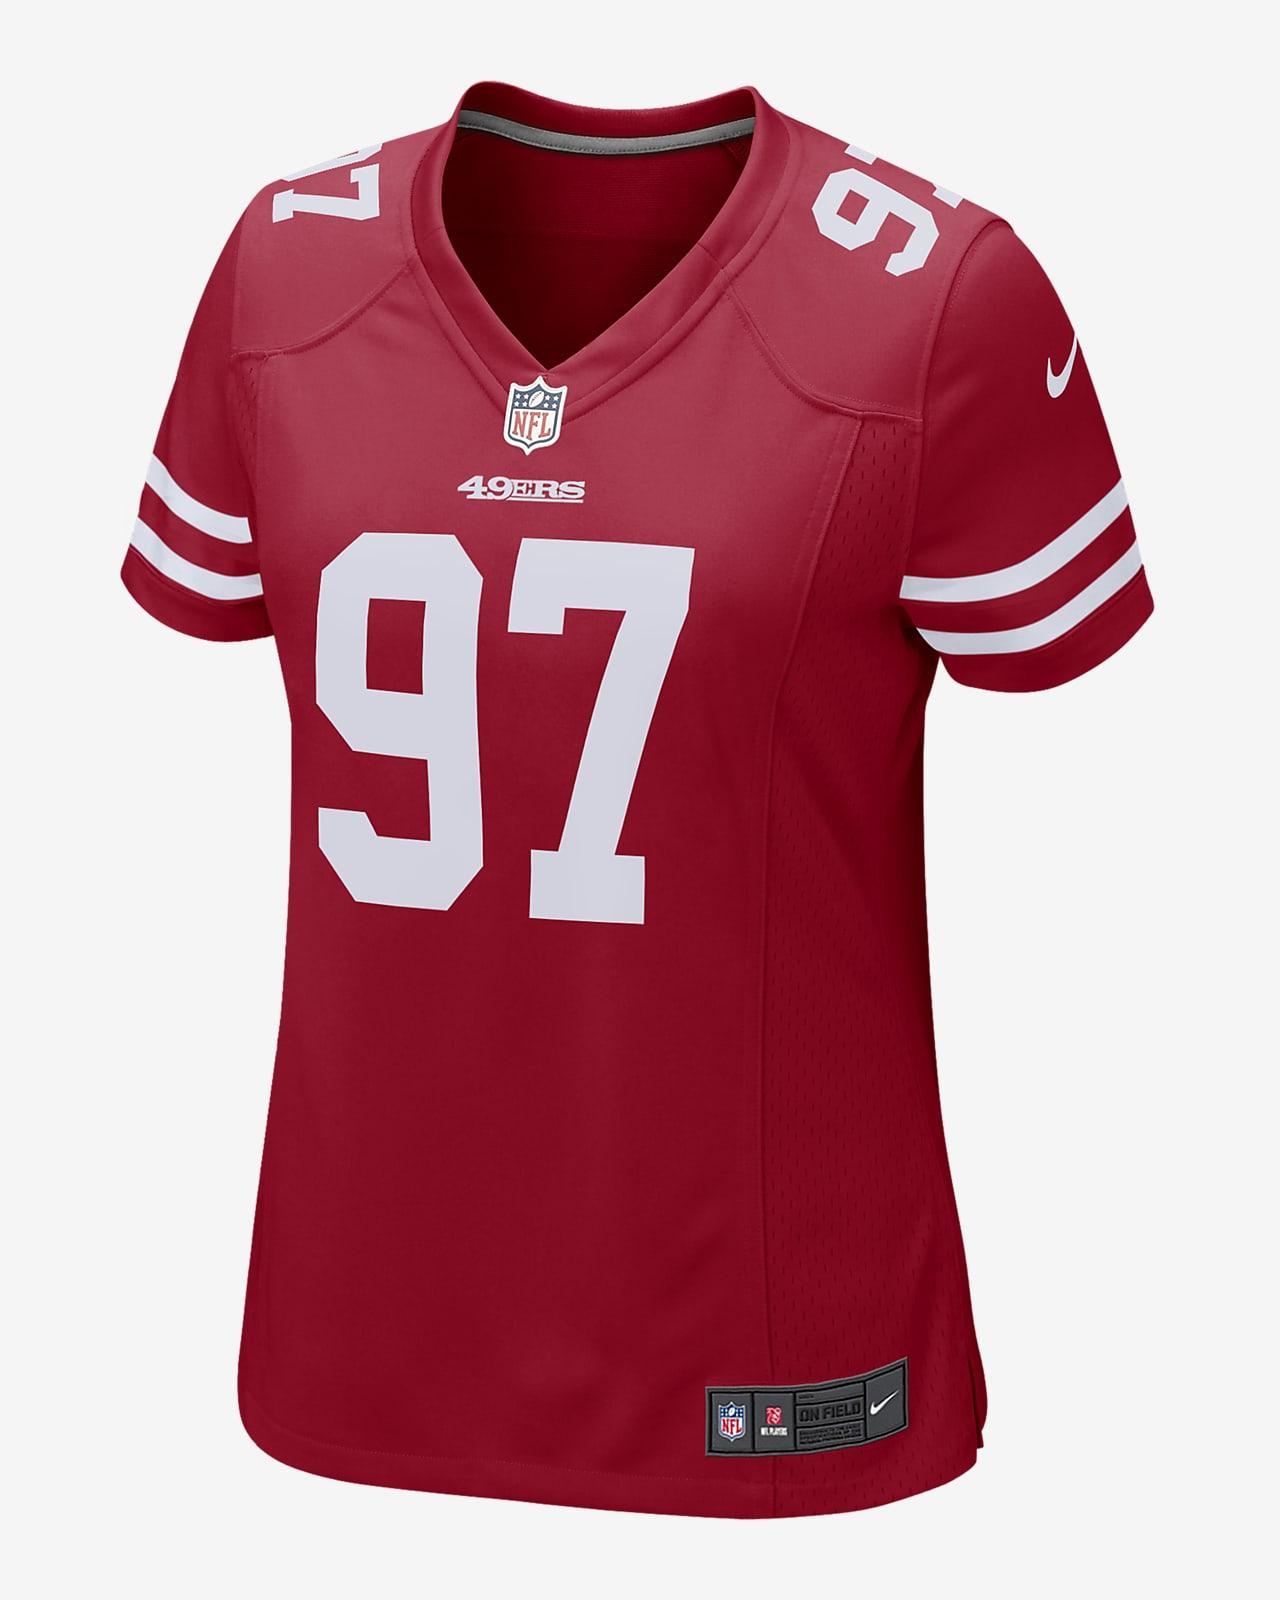 NFL San Francisco 49ers (Nick Bosa) Women's Game Football Jersey